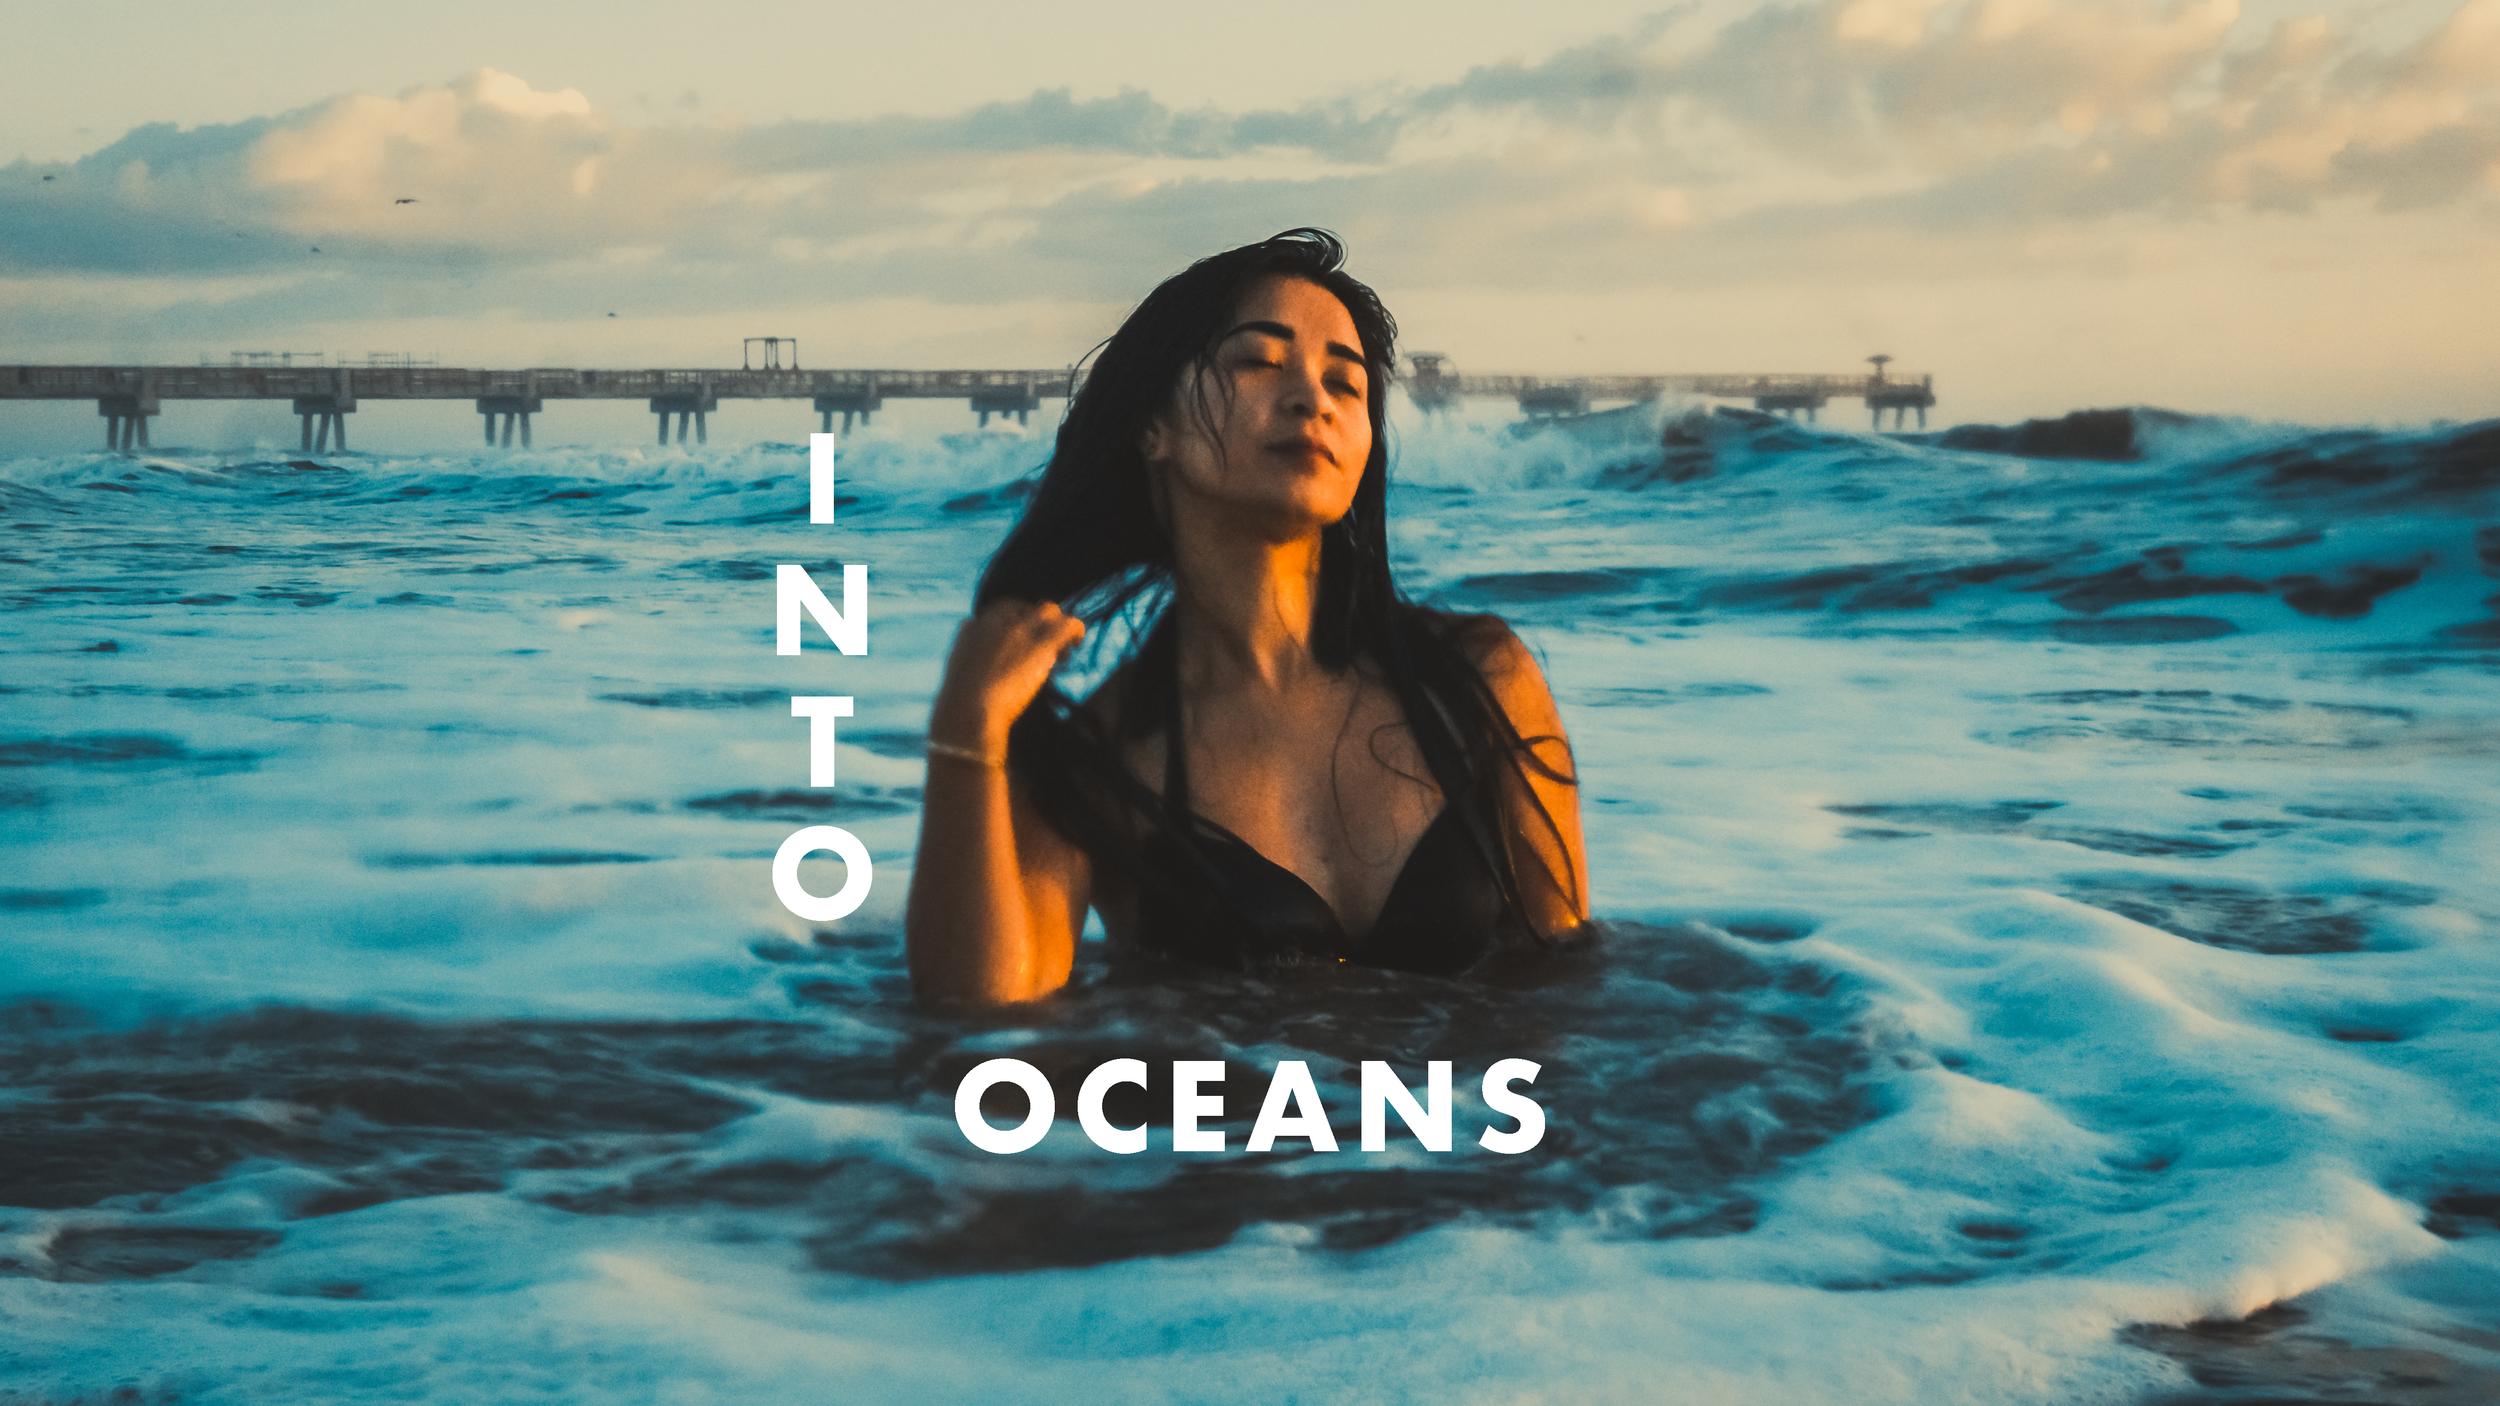 Into Oceans_Jen.png